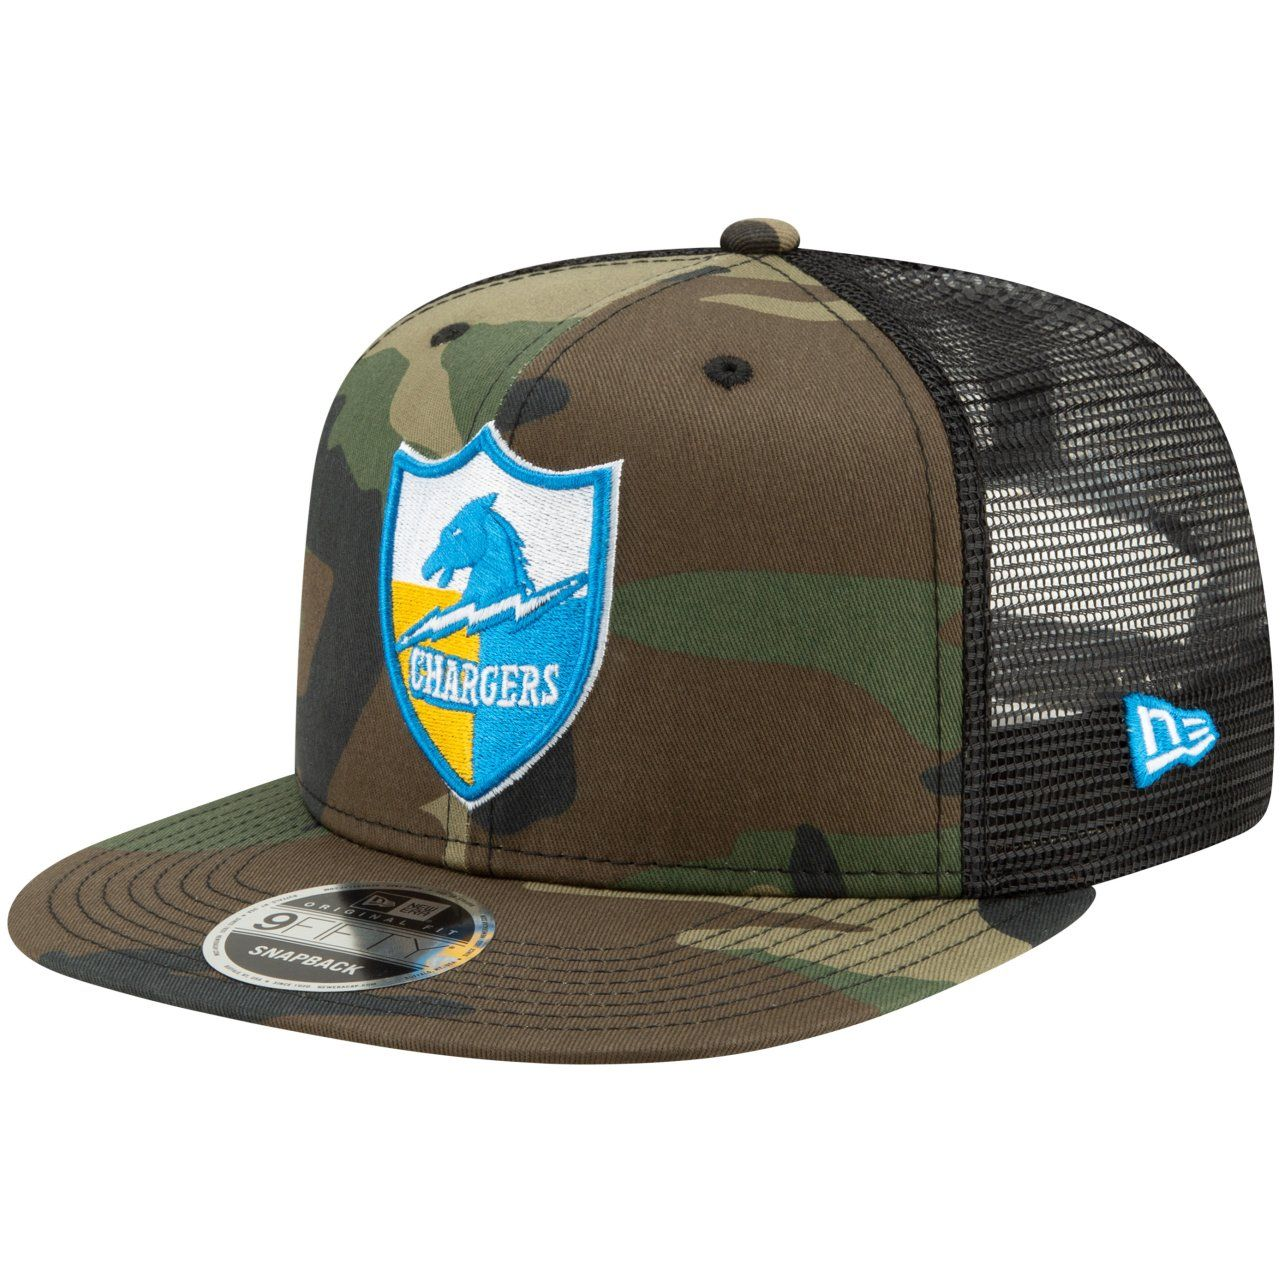 amfoo - Throwback San Diego Chargers Mesh 9Fifty Snapback Cap wood